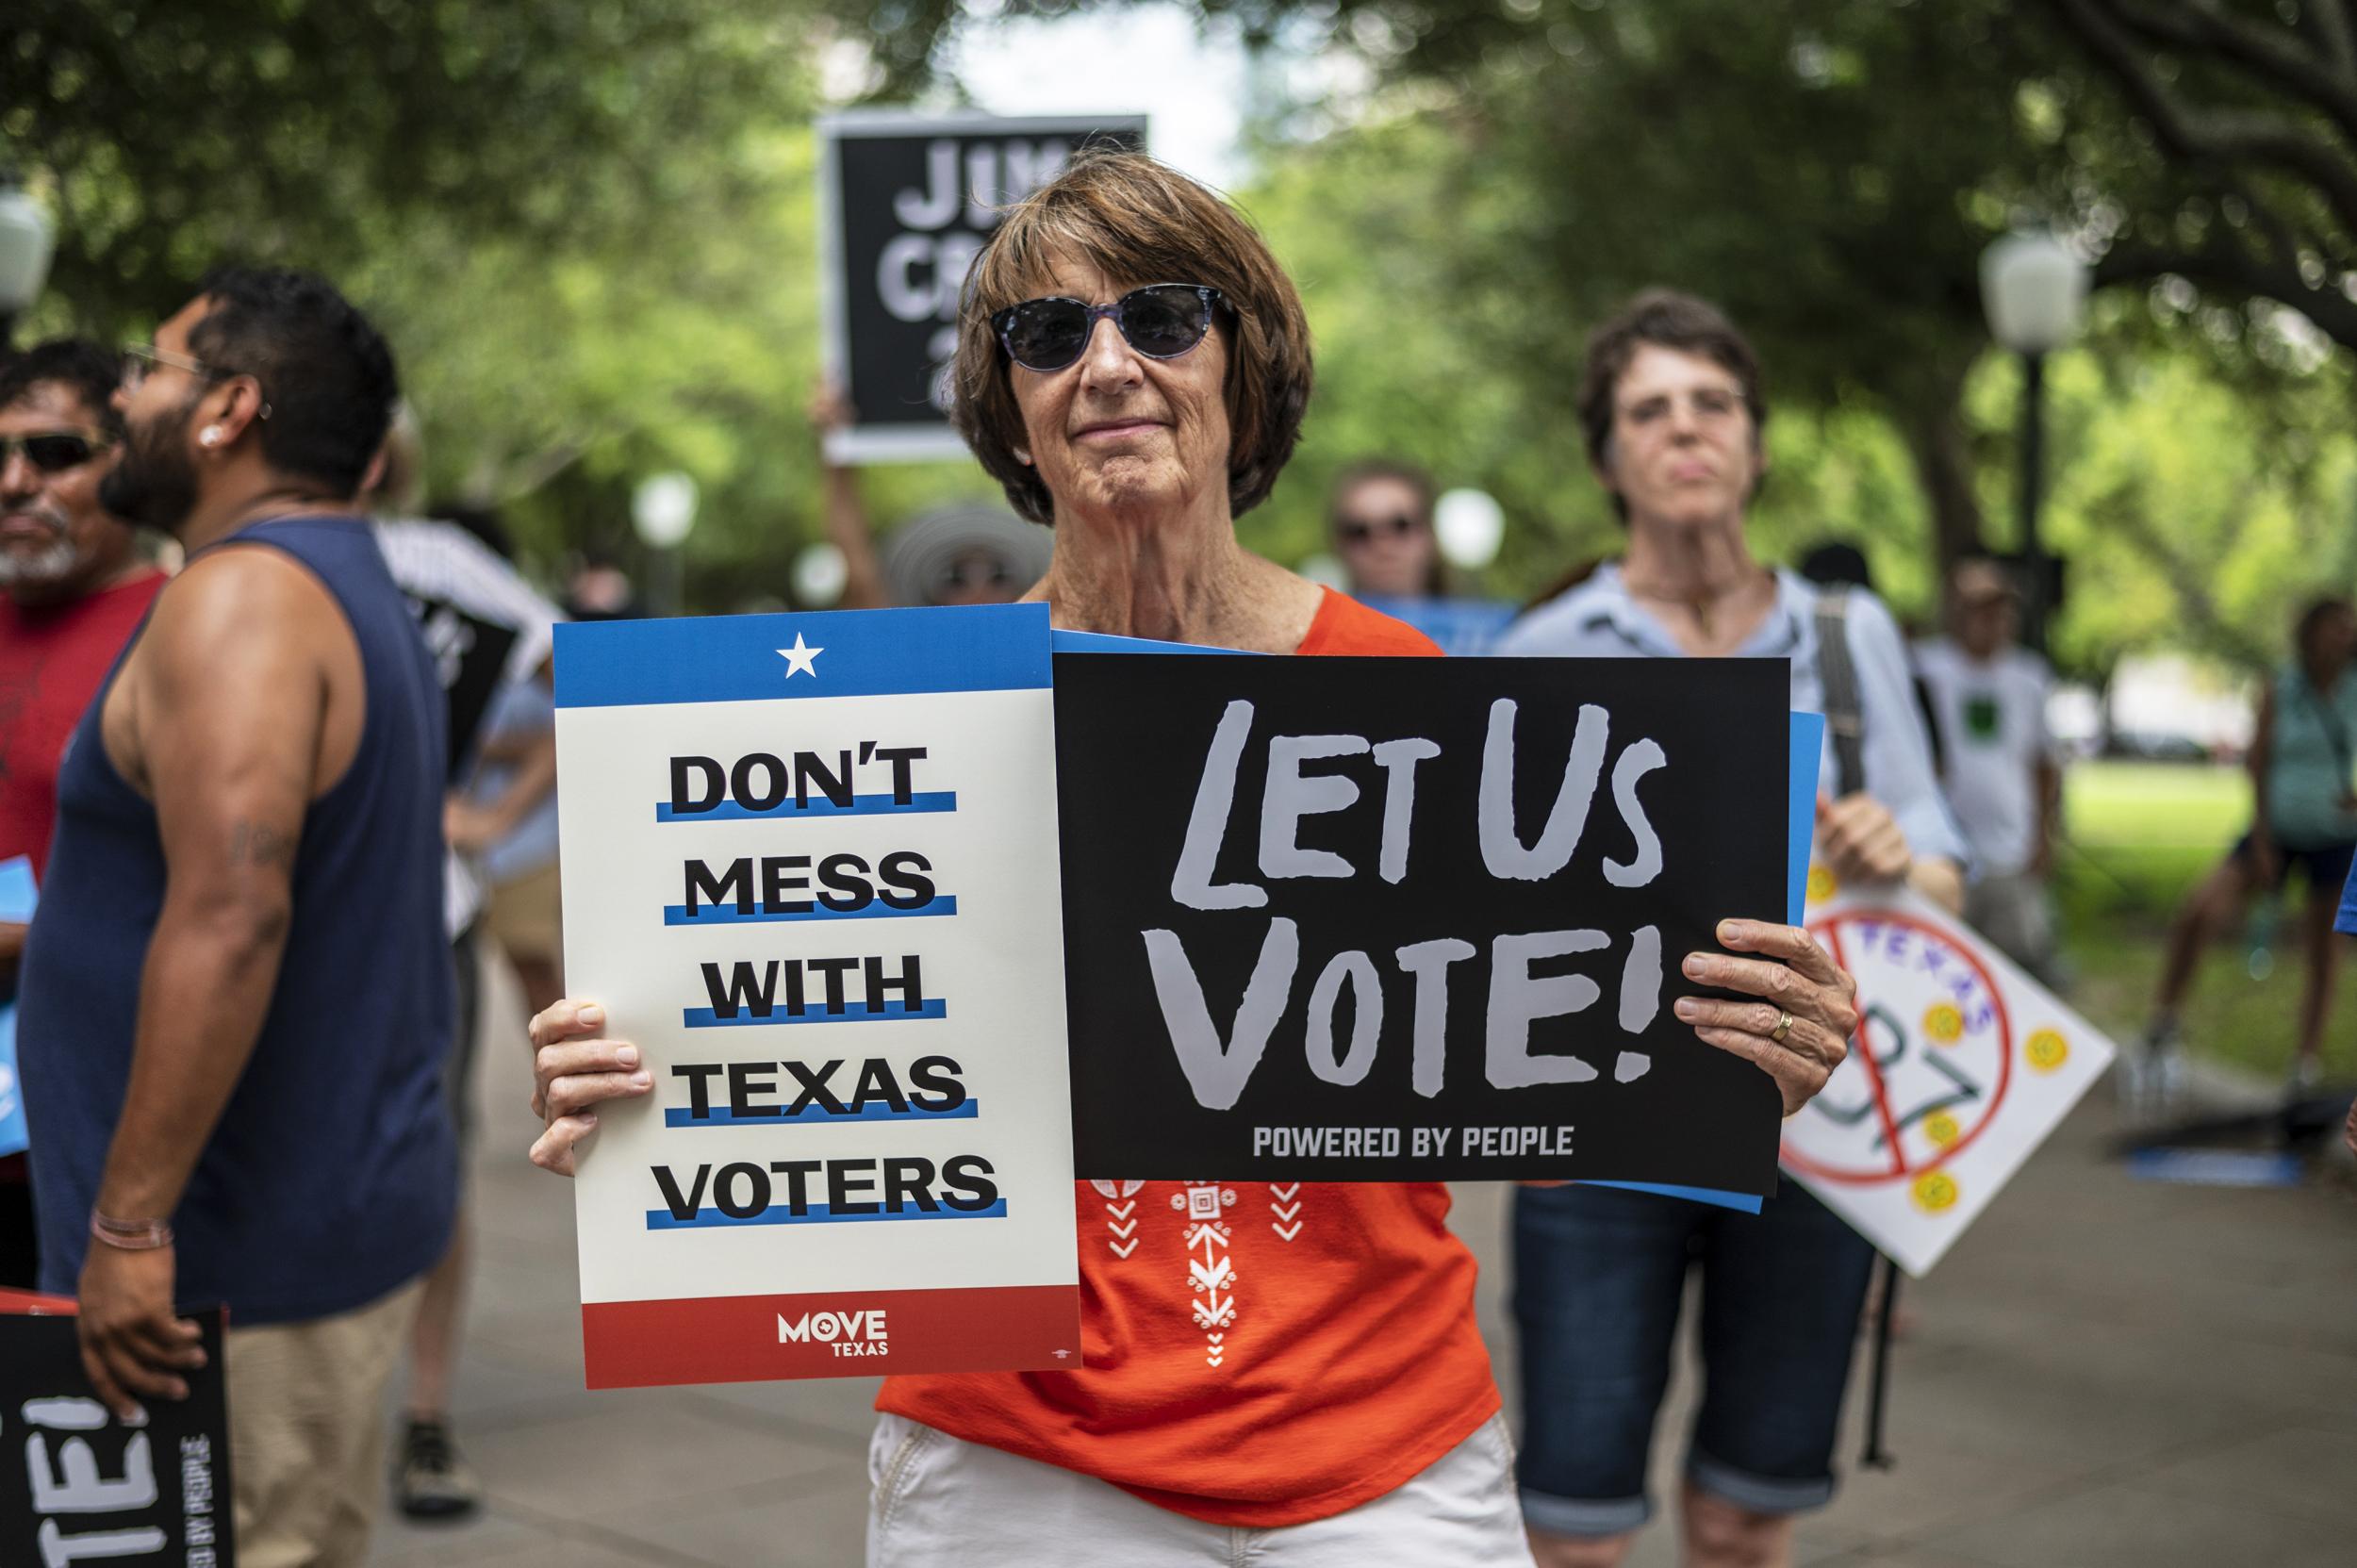 Texas Republicans' restrictive election bill gets final green light